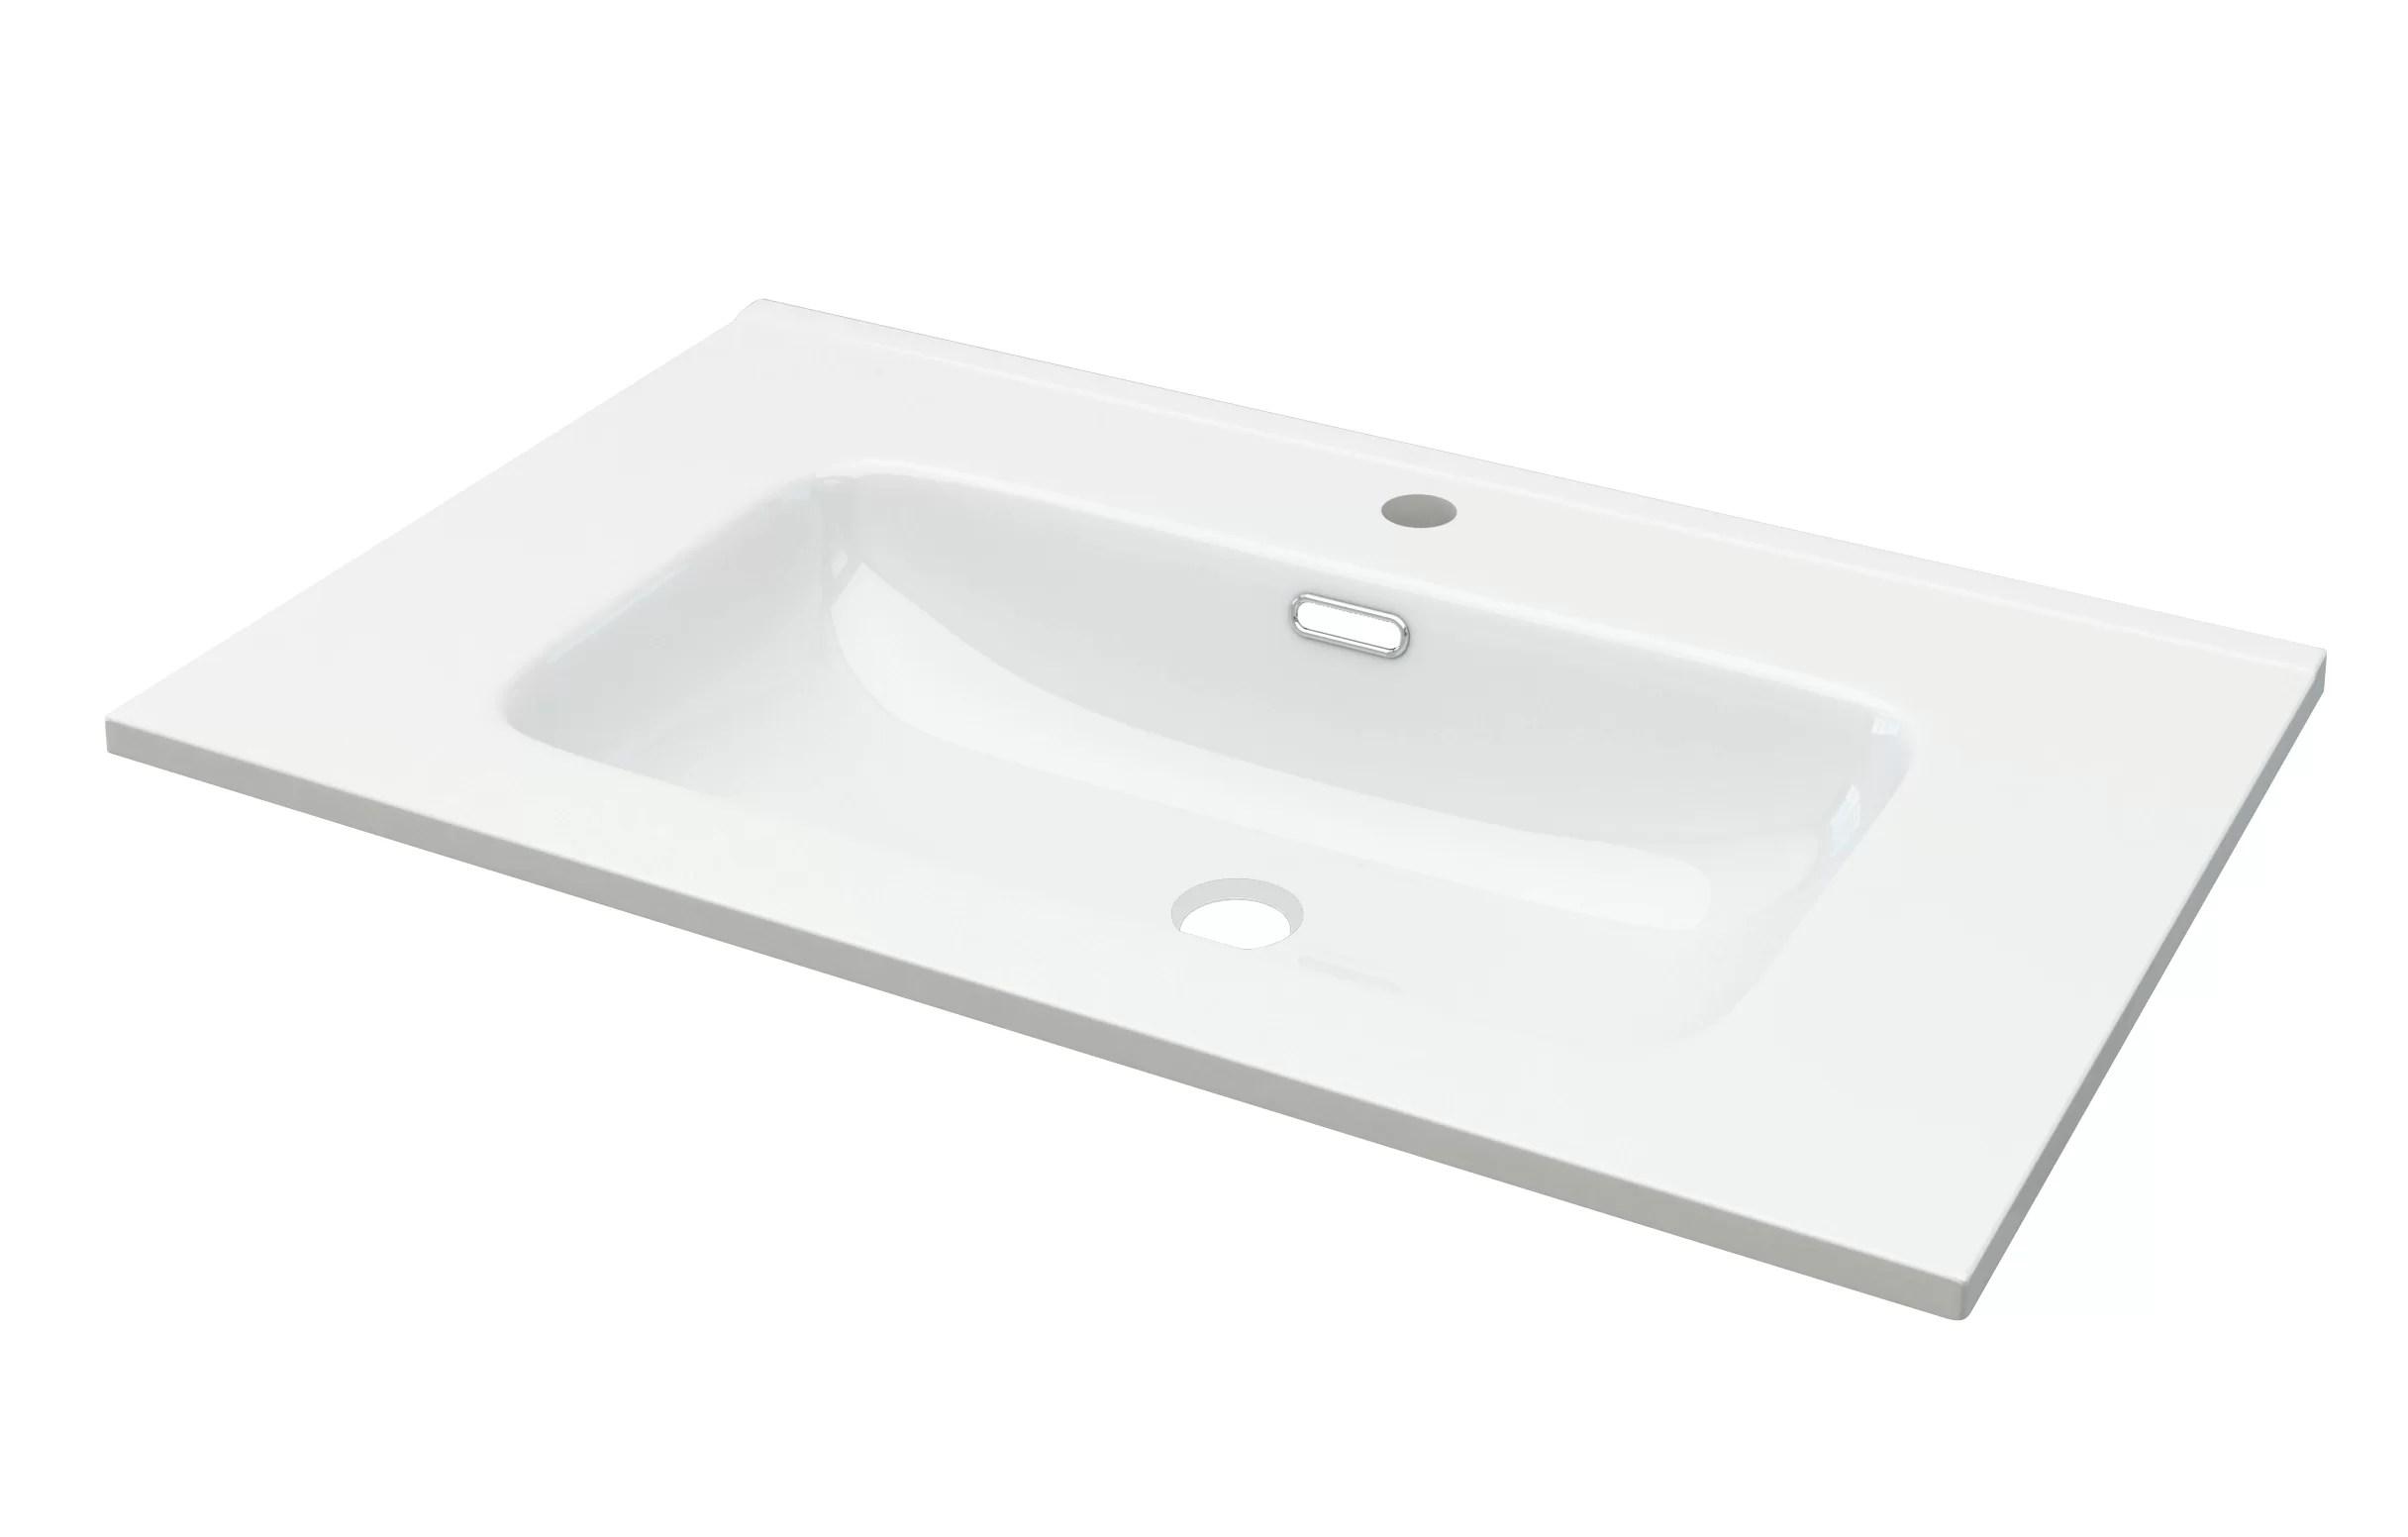 Baden Haus Ceramic Rectangular Trough Bathroom Sink Wayfair Co Uk